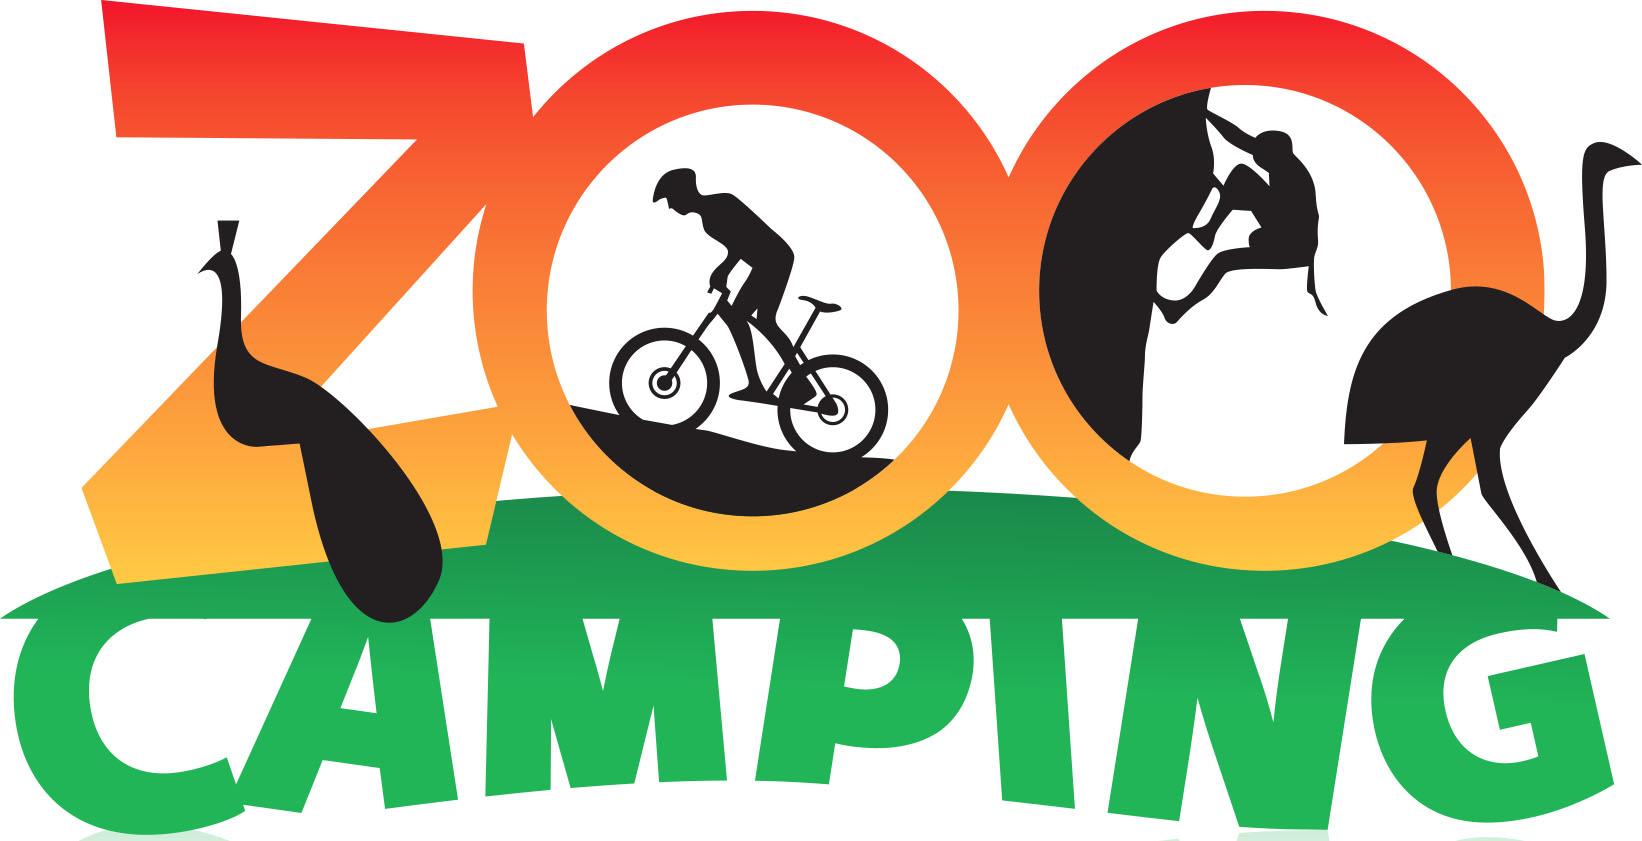 1642x841 Contact Camping Zoo